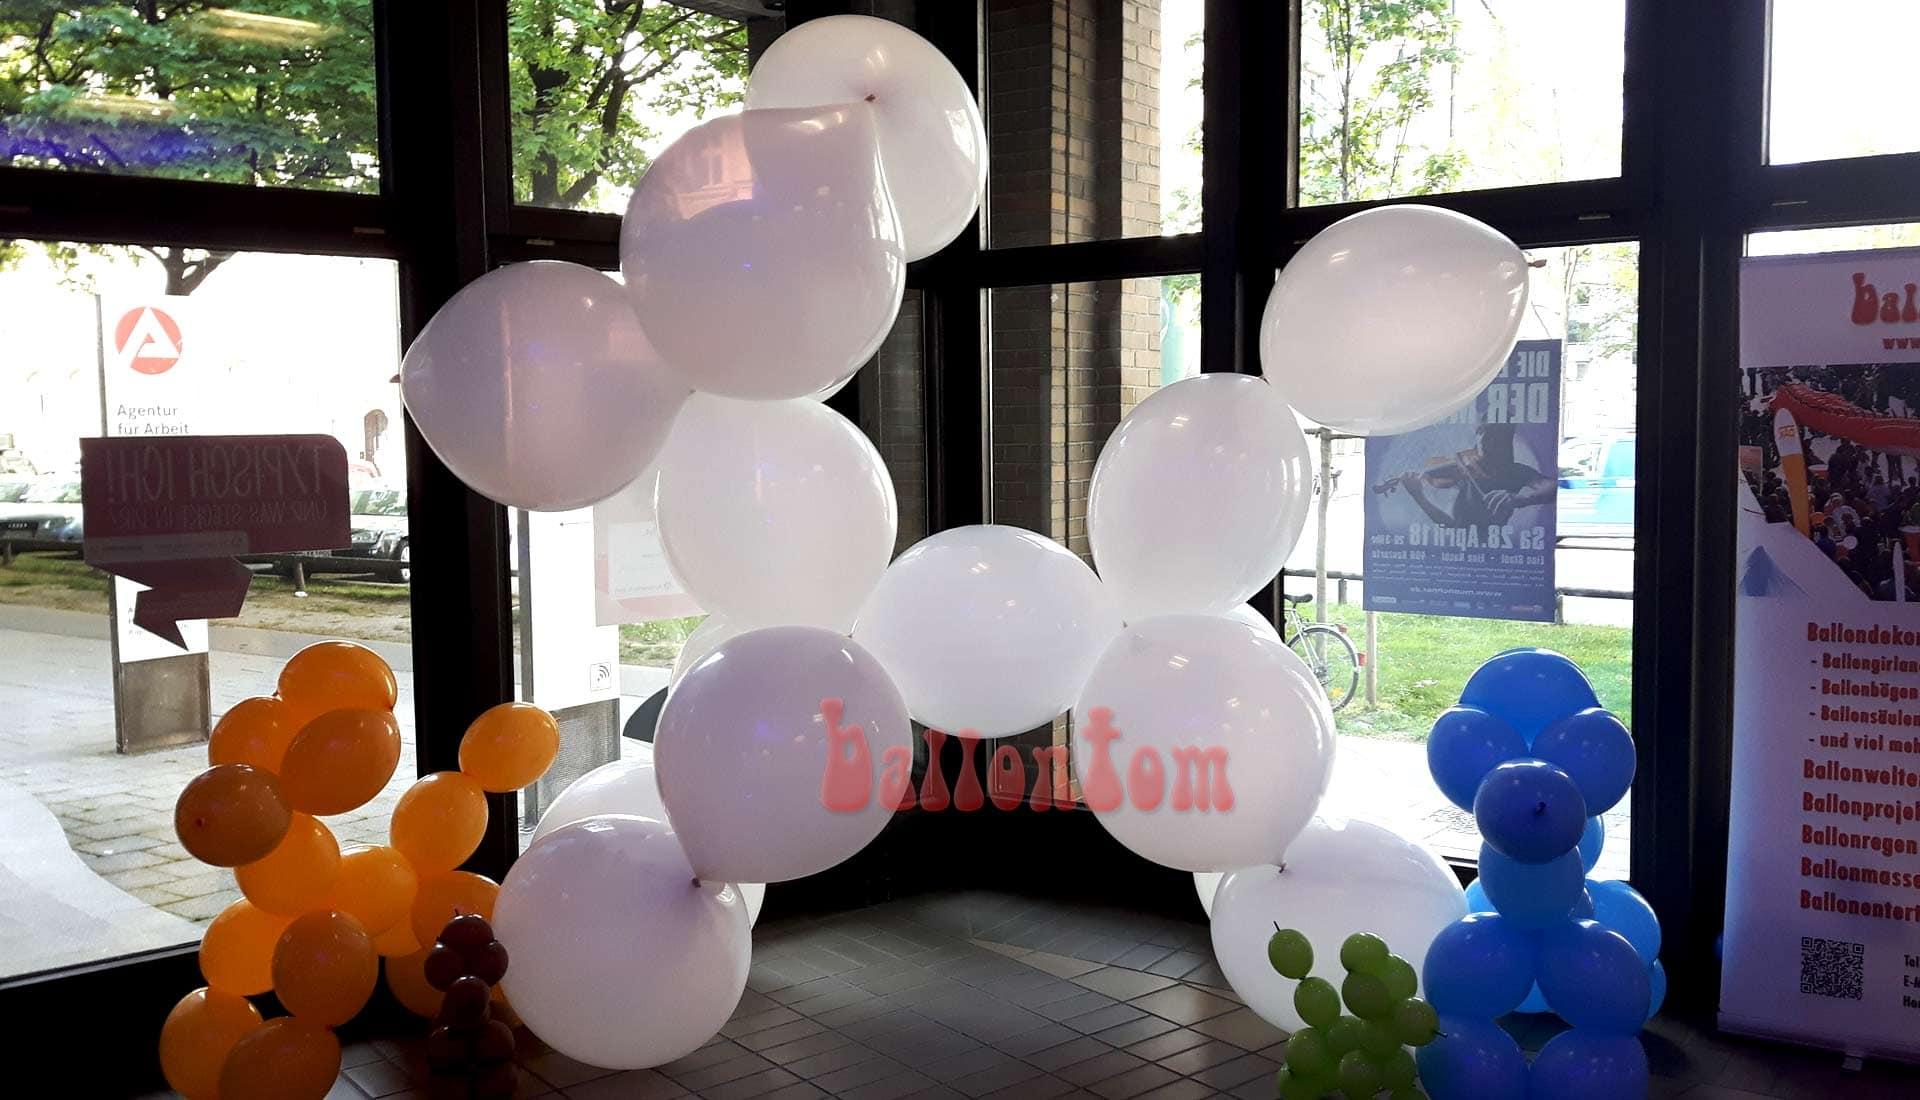 Ballonshow Augsburg